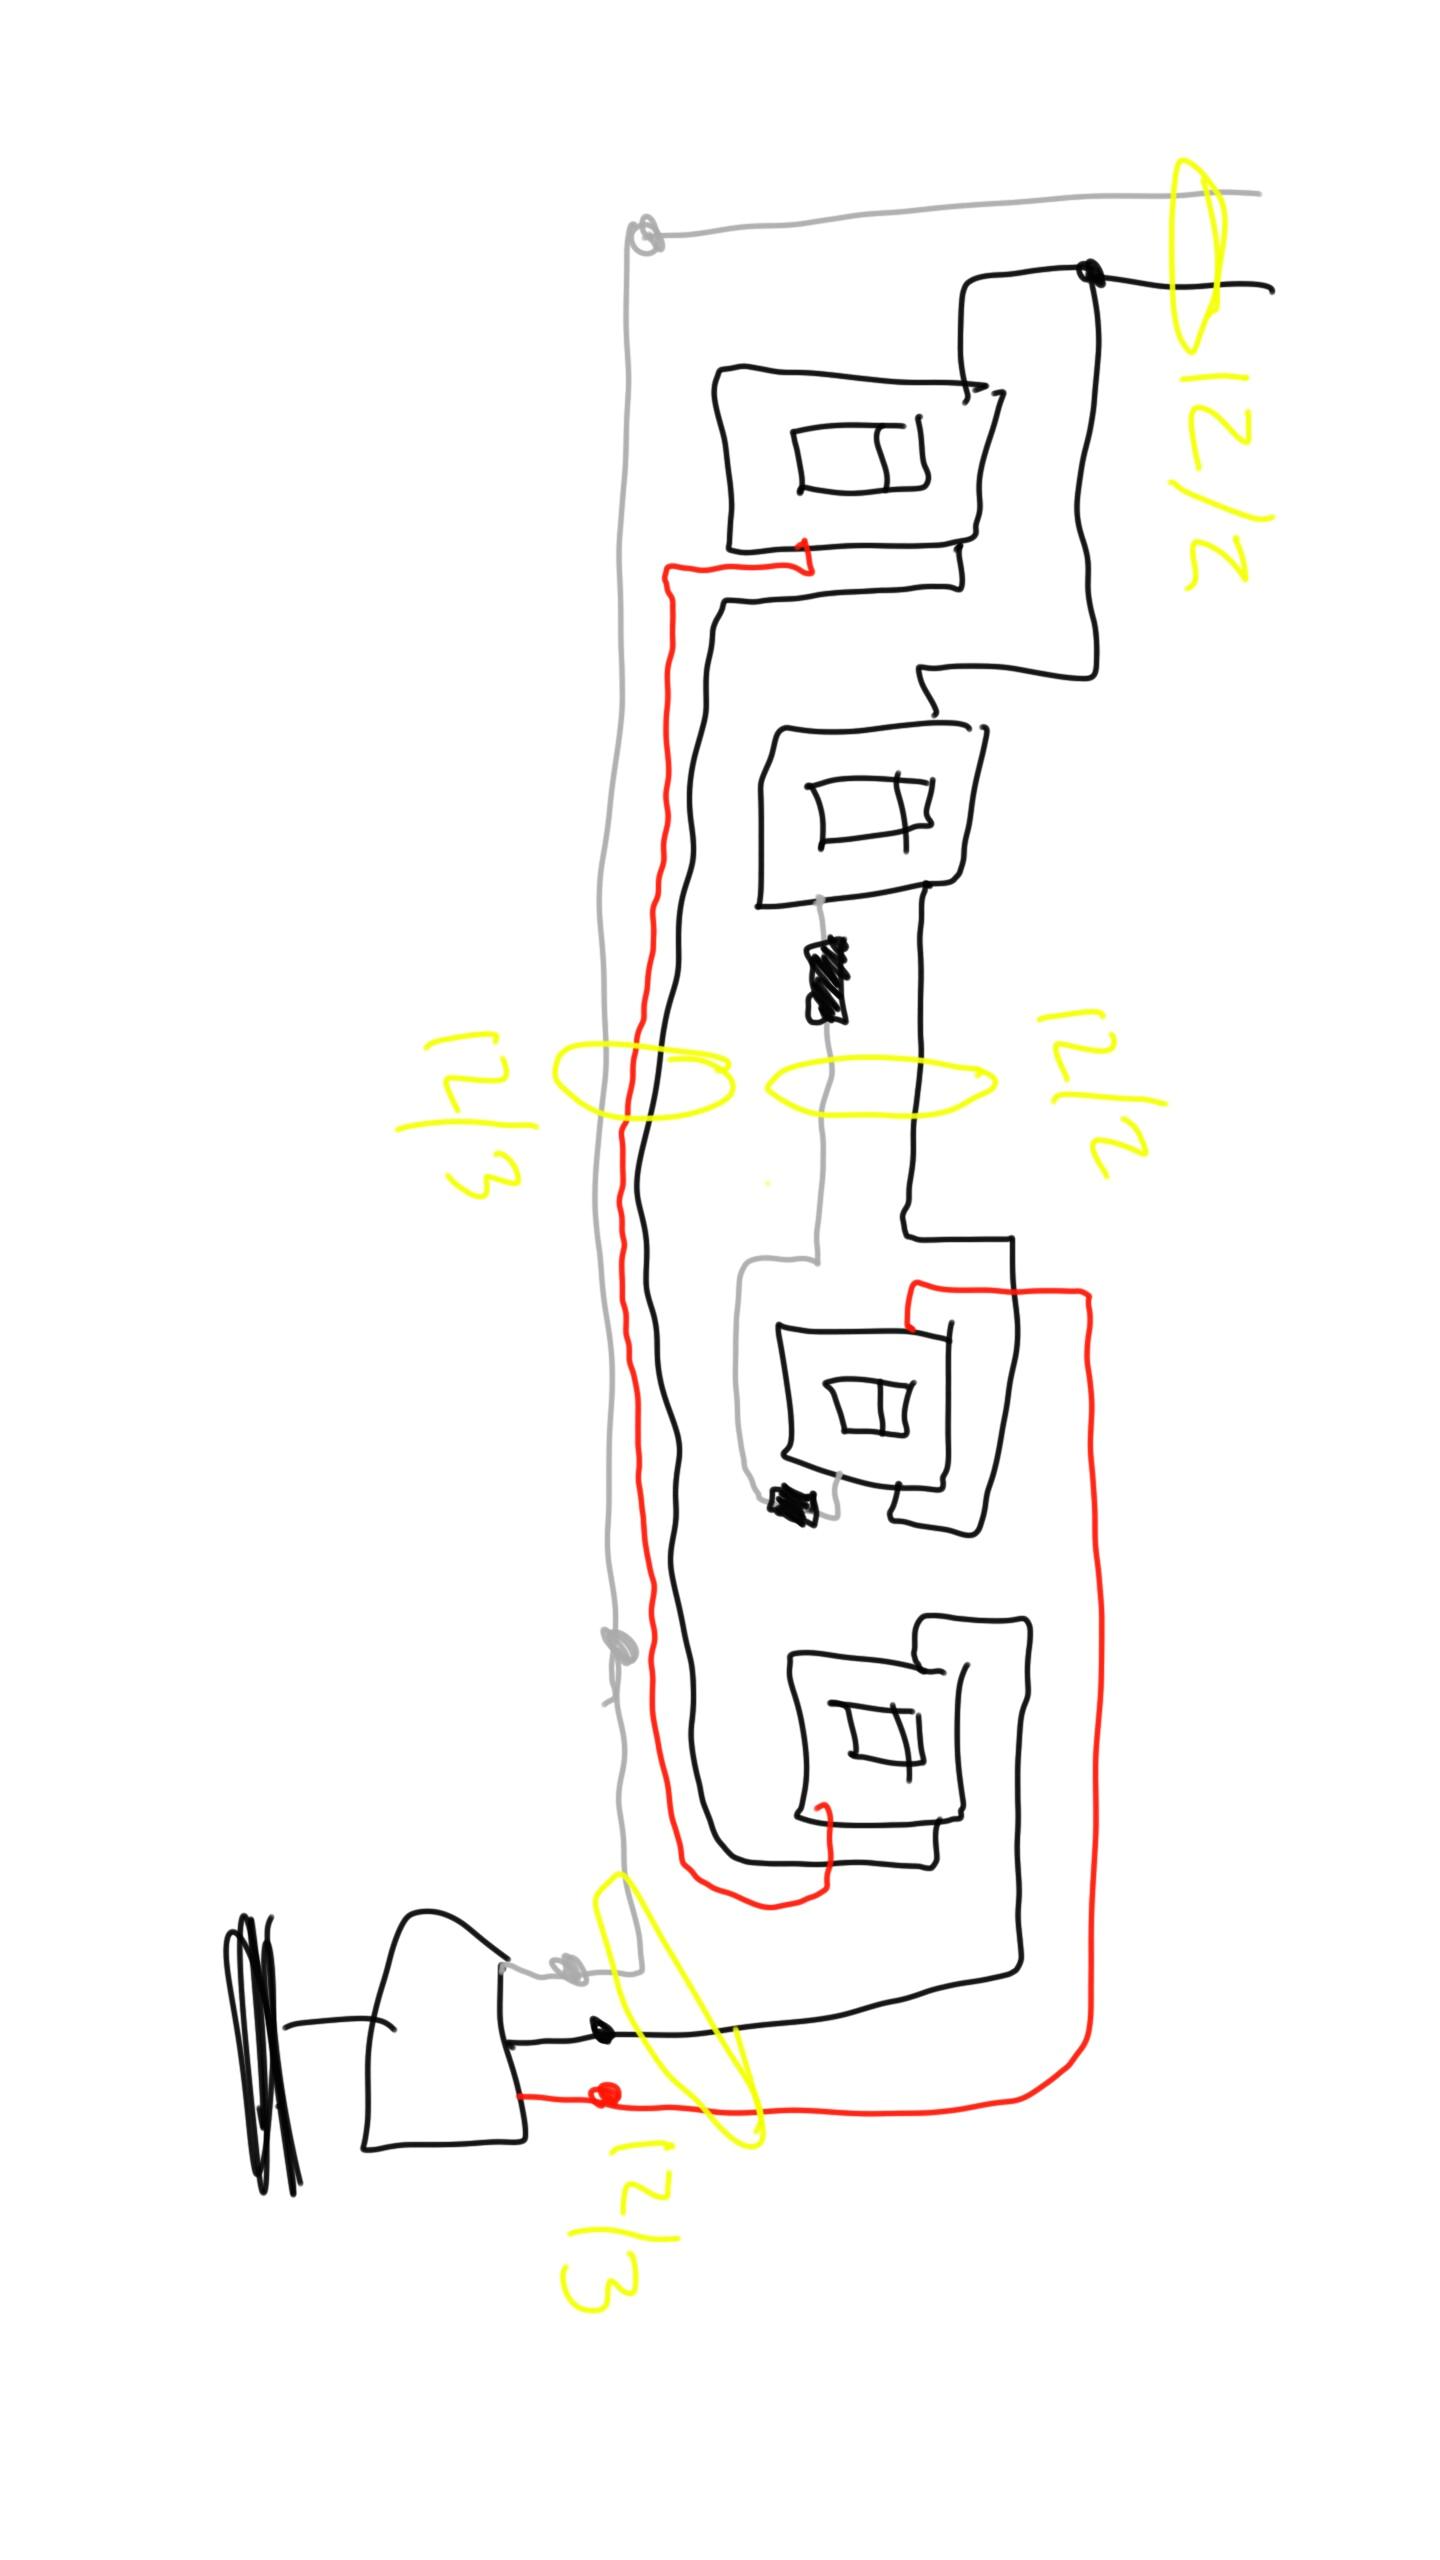 way fan light wiring diagram expert lkcee and broan pin alternator best bathroom jpg